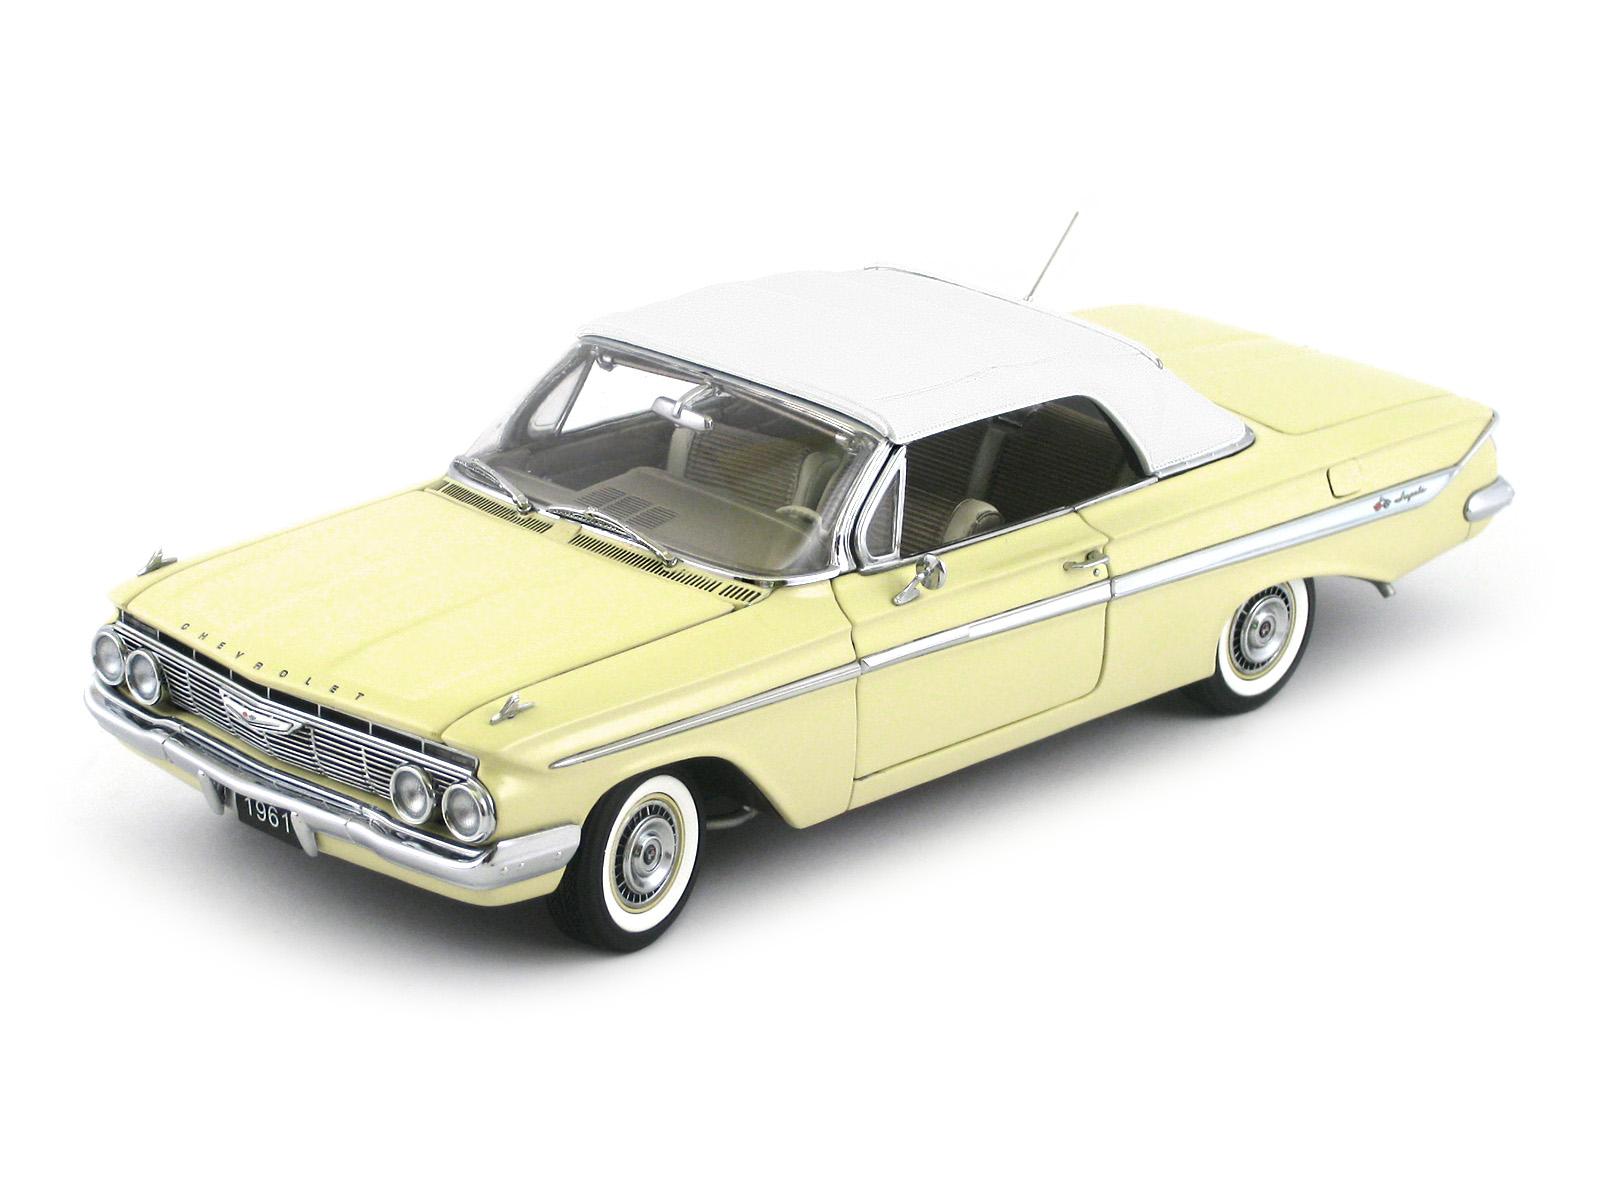 1961 Chevrolet Impala Convertible West Coast Precision Diecast